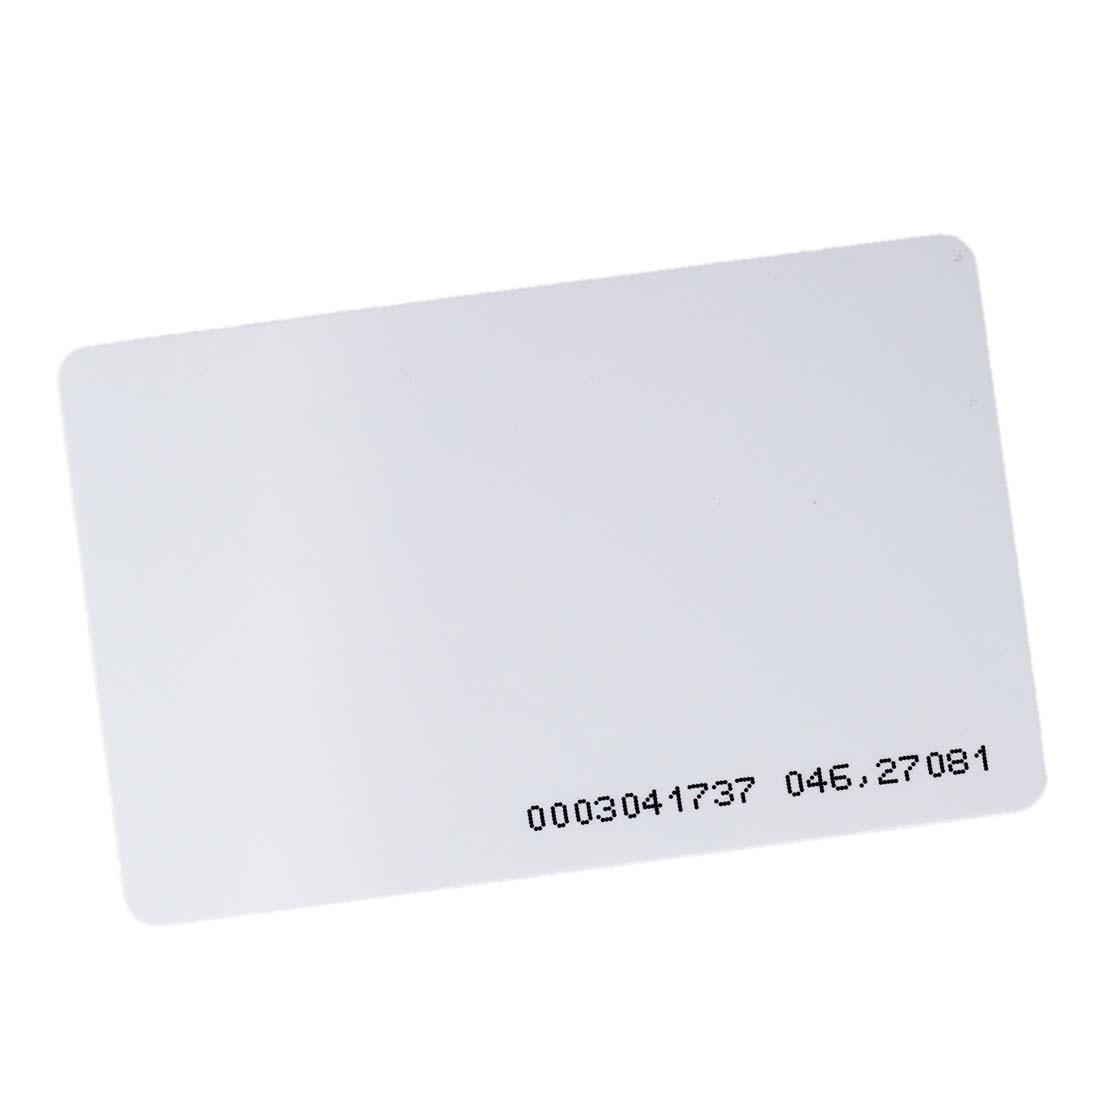 2 Packs 150 pcs ID badge access EM4100 125 kHz RFID kitavt75417unv10200 value kit advantus id badge holder chain avt75417 and universal small binder clips unv10200